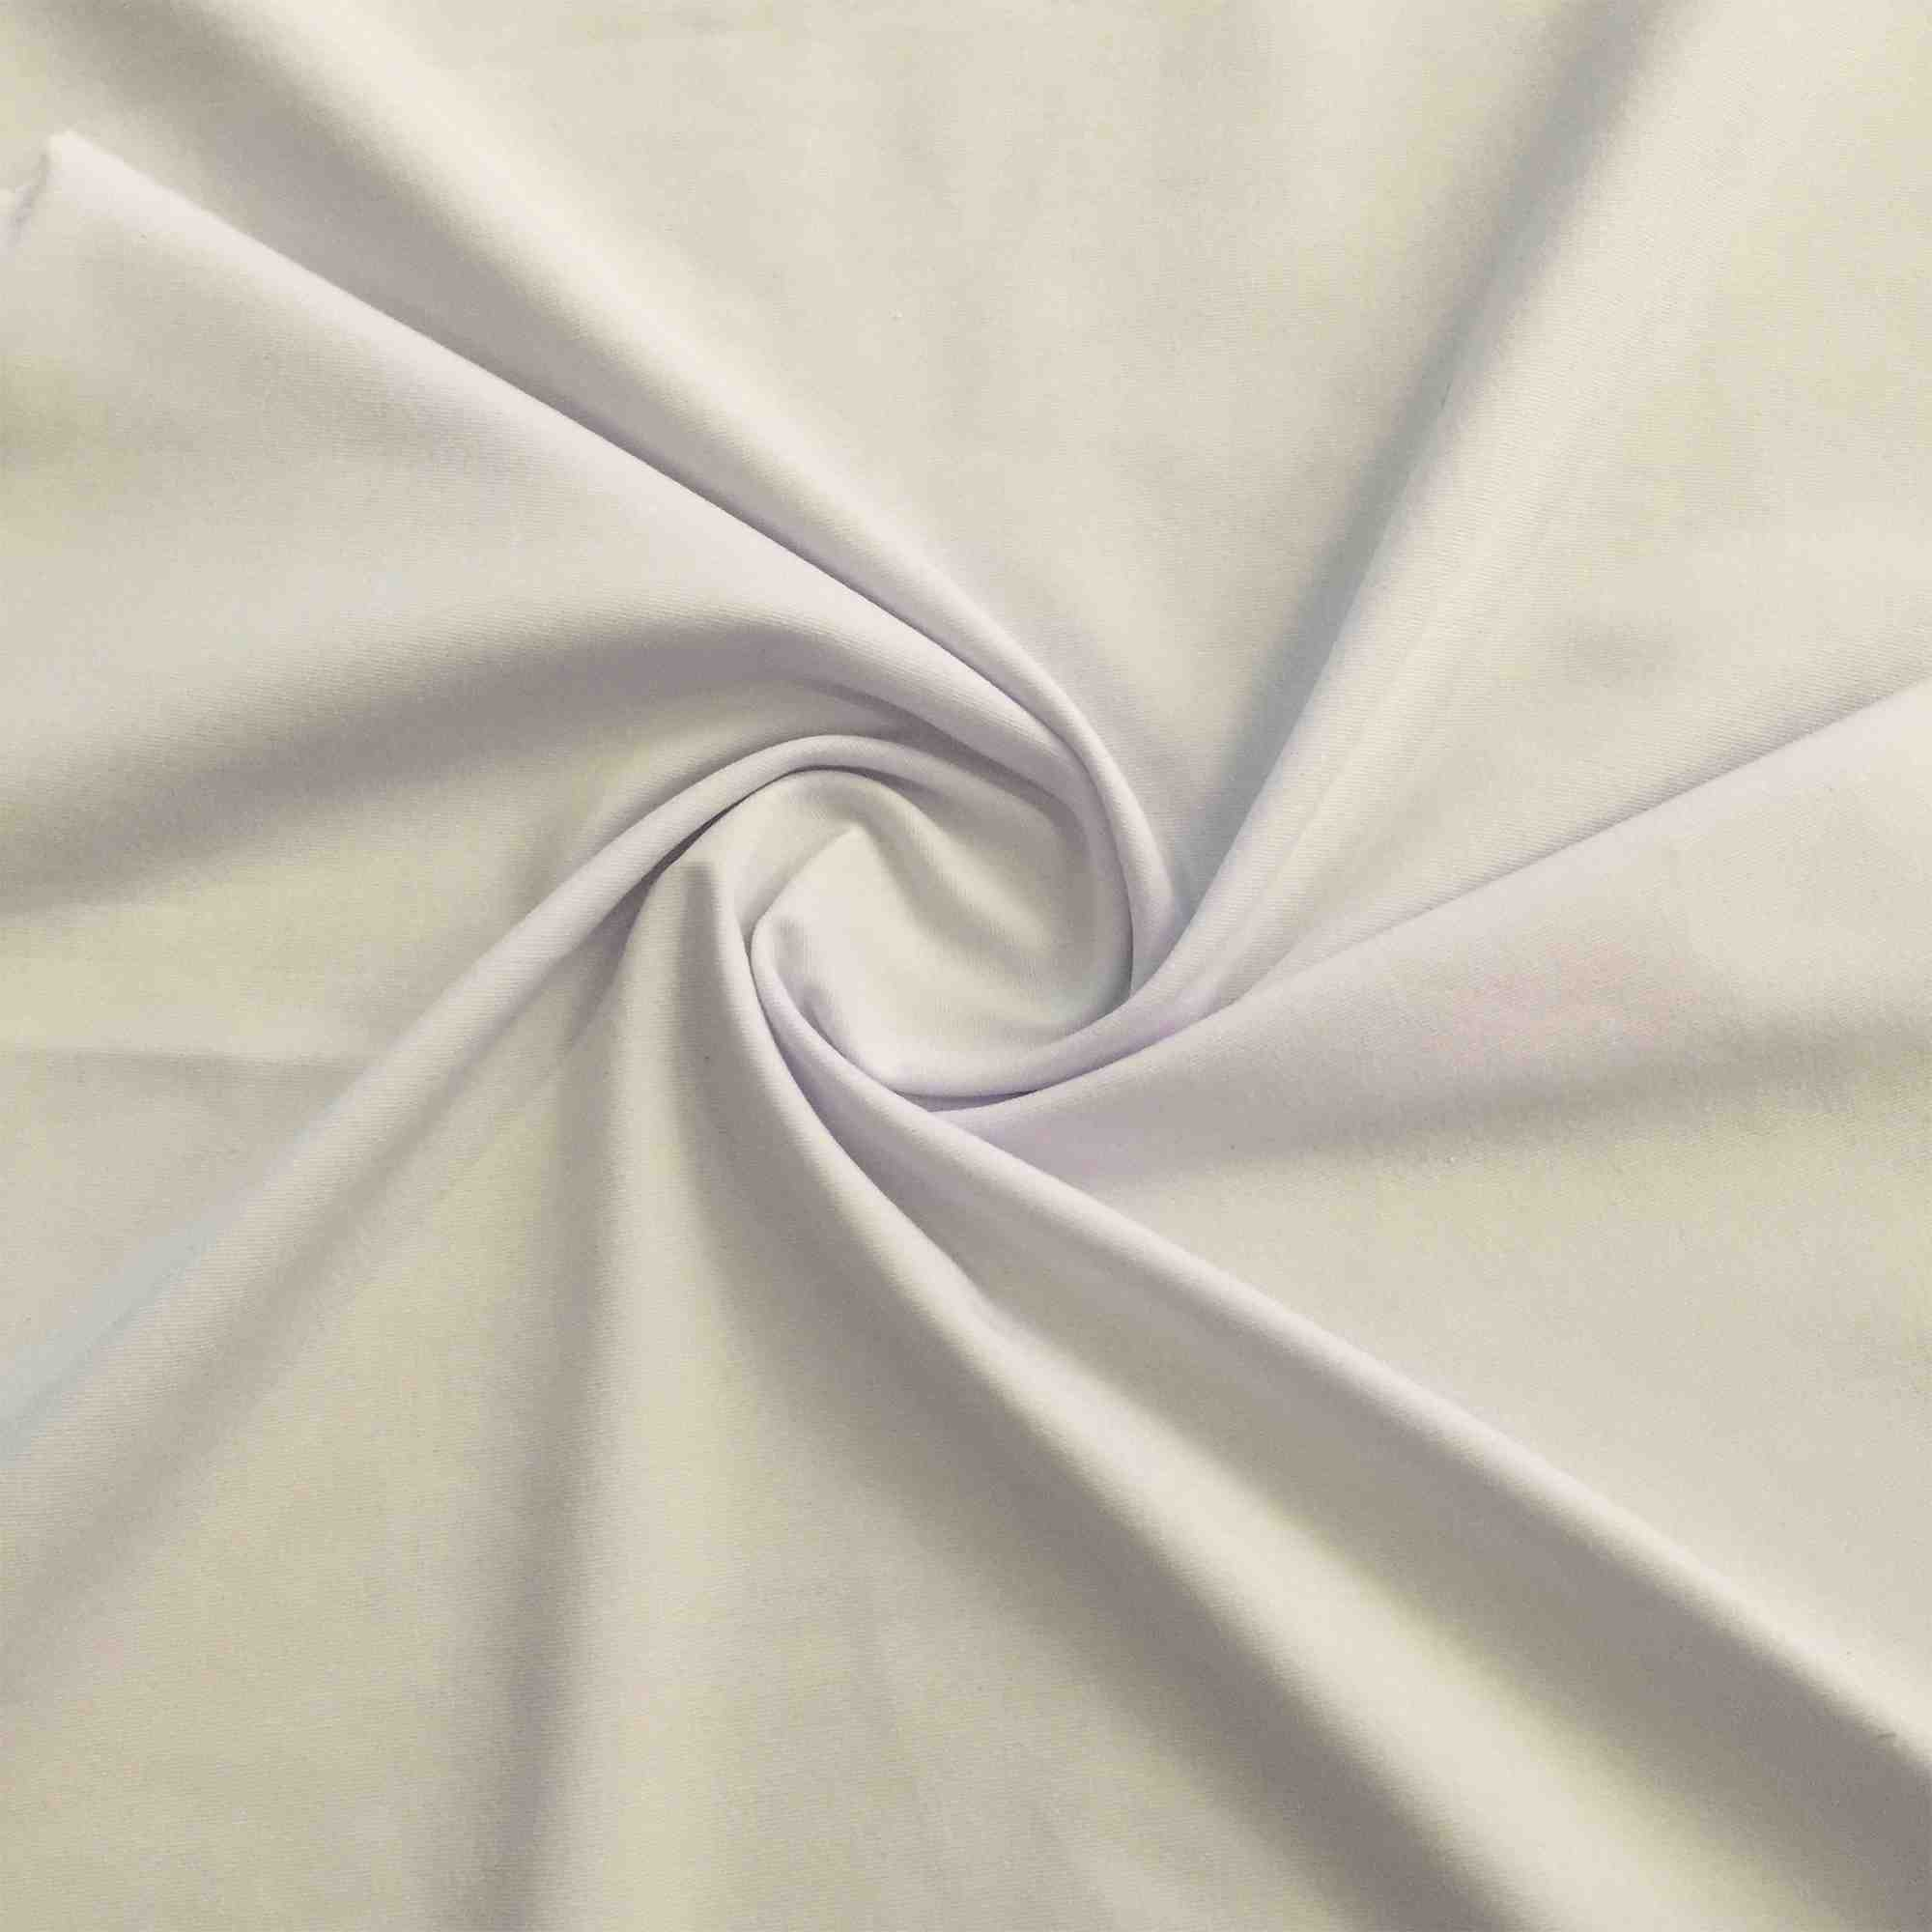 Polimeryl Liso Branco